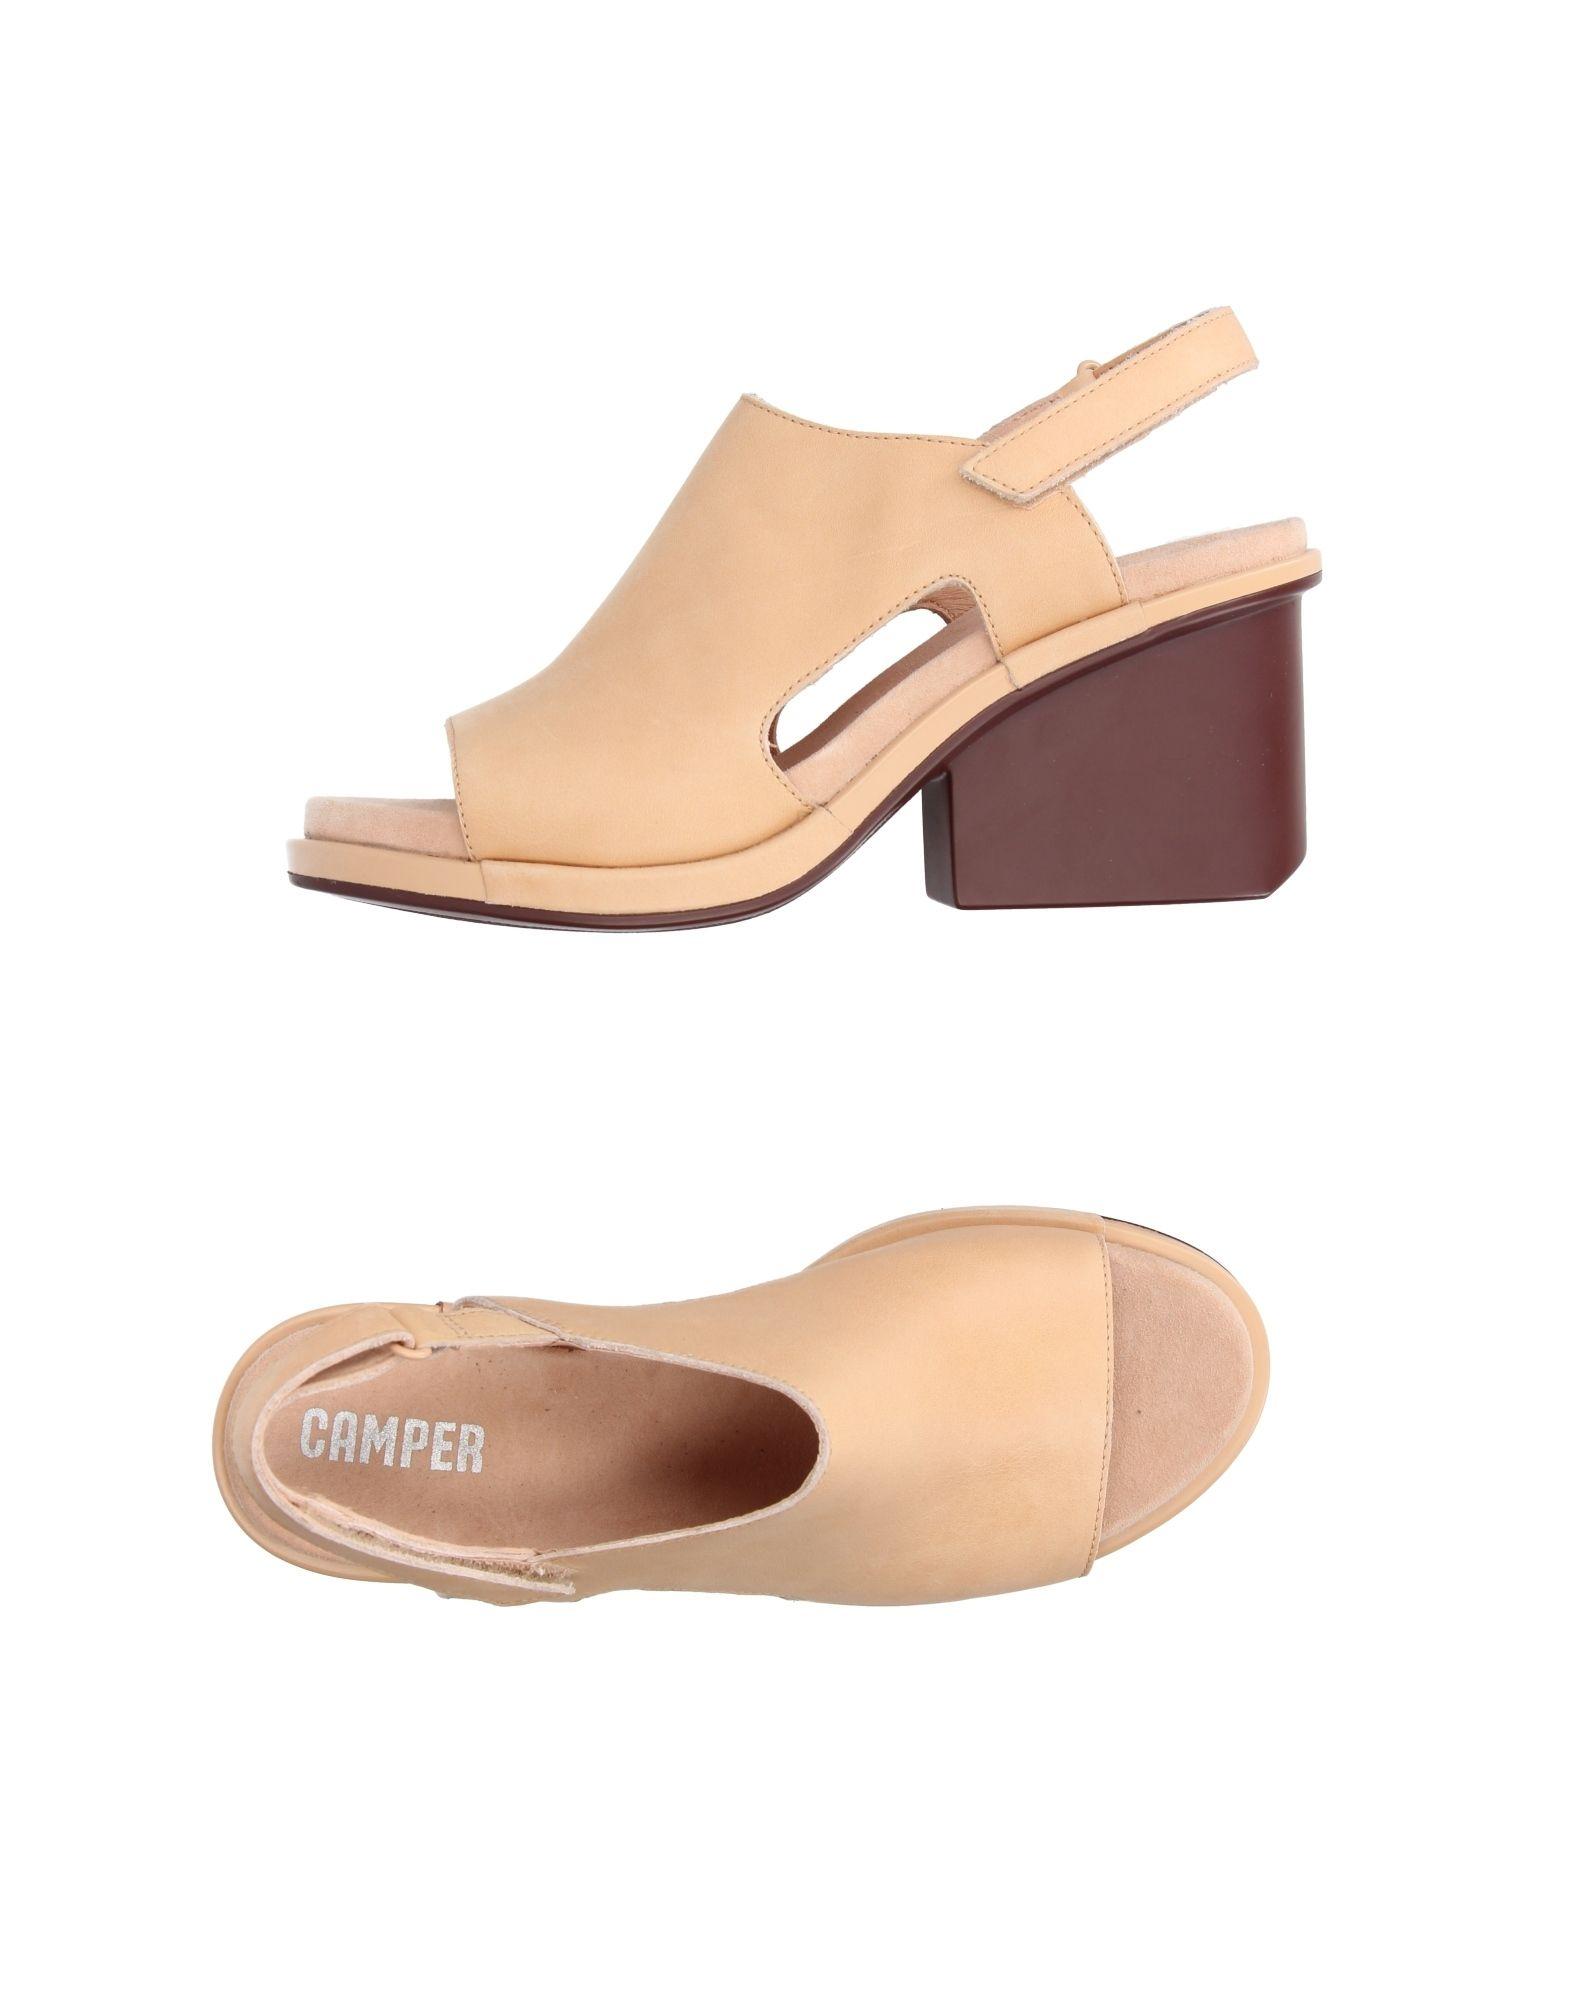 Stilvolle Damen billige Schuhe Camper Sandalen Damen Stilvolle  11206559FL 893280